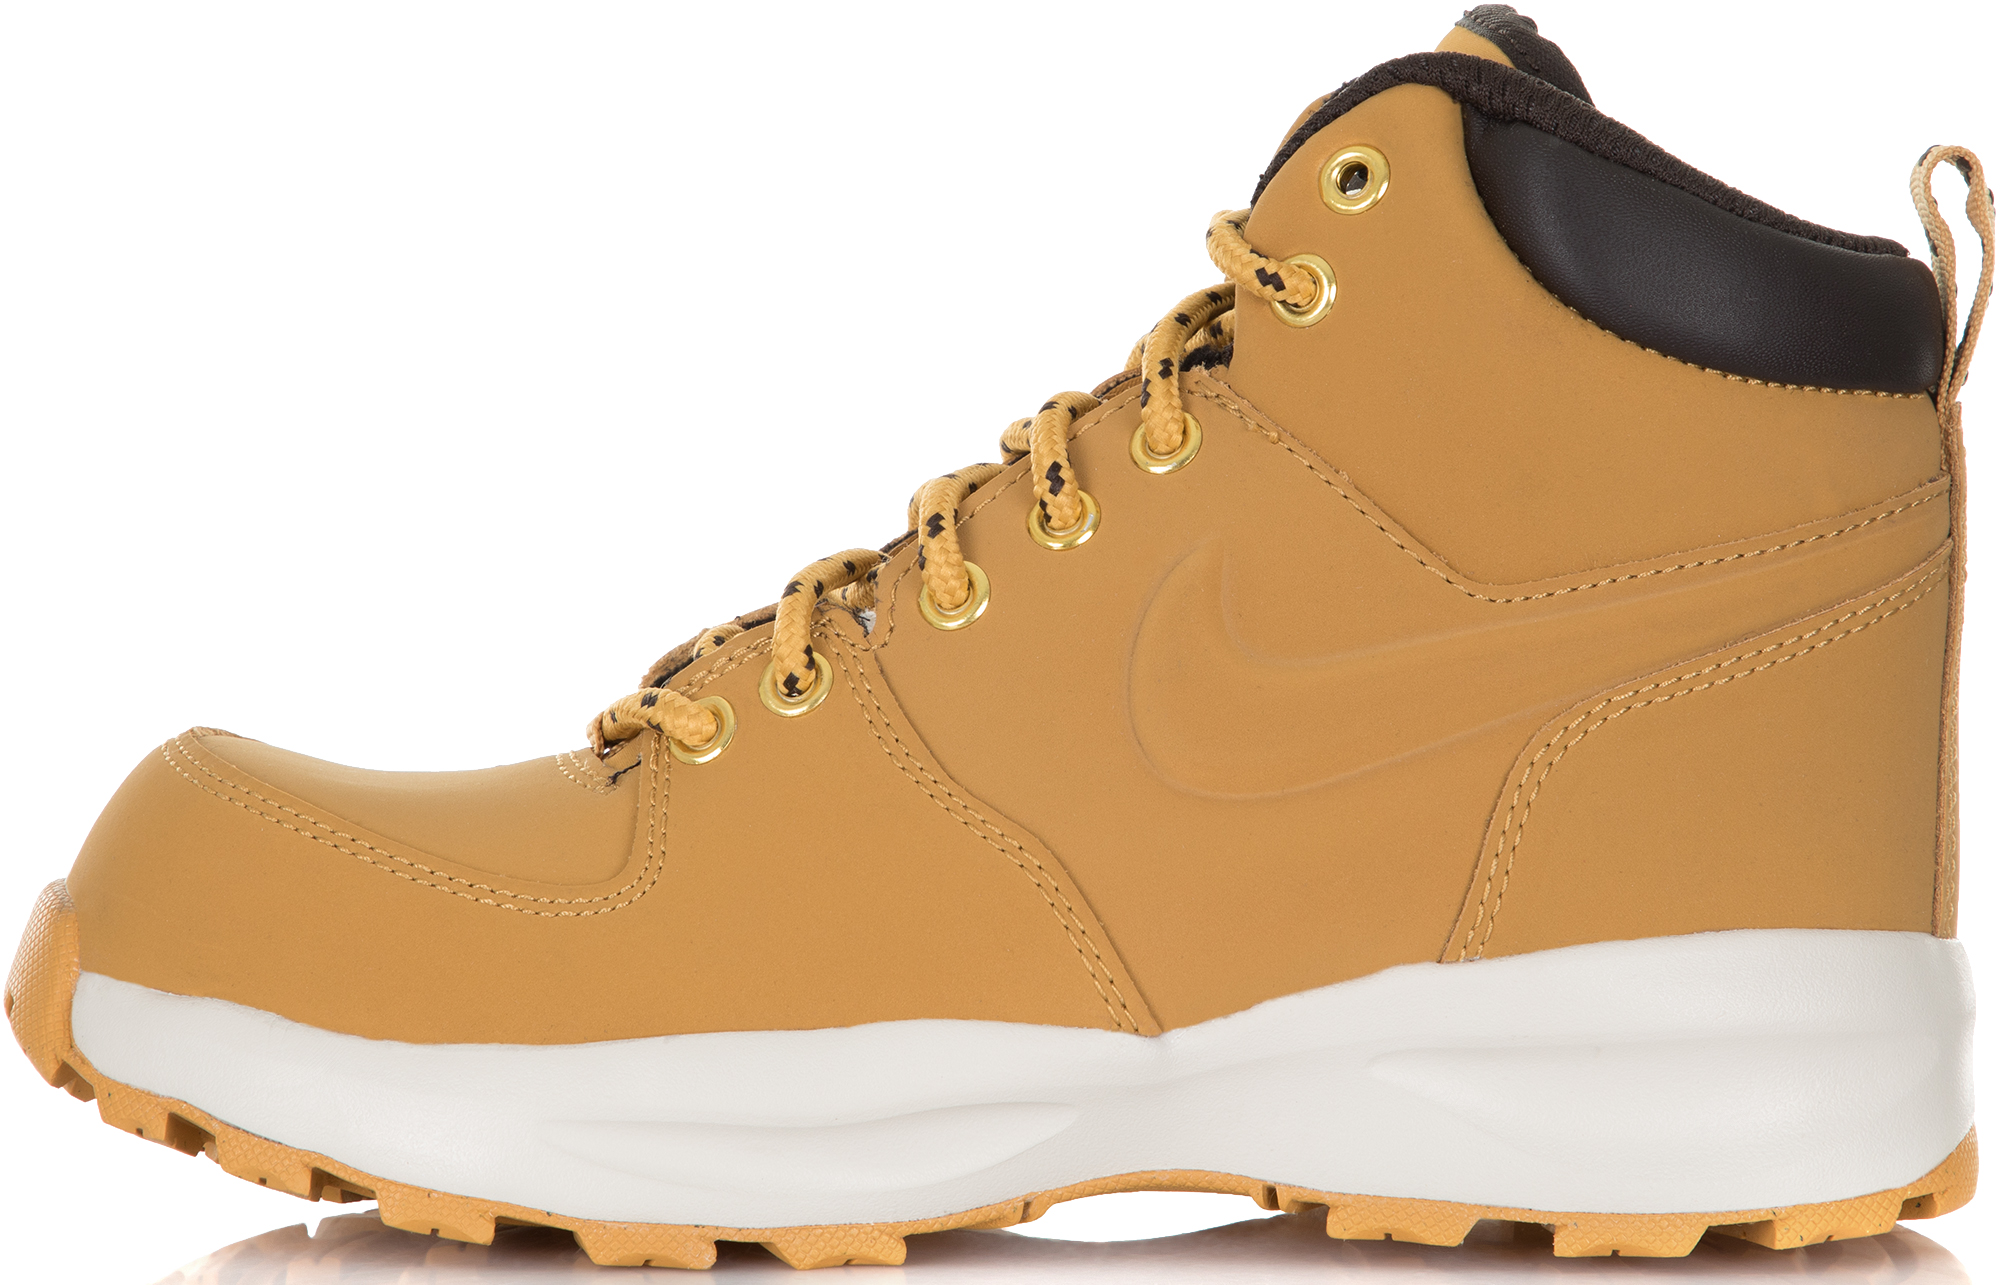 Nike Ботинки для мальчиков Nike Manoa 17, размер 37 цена 2017